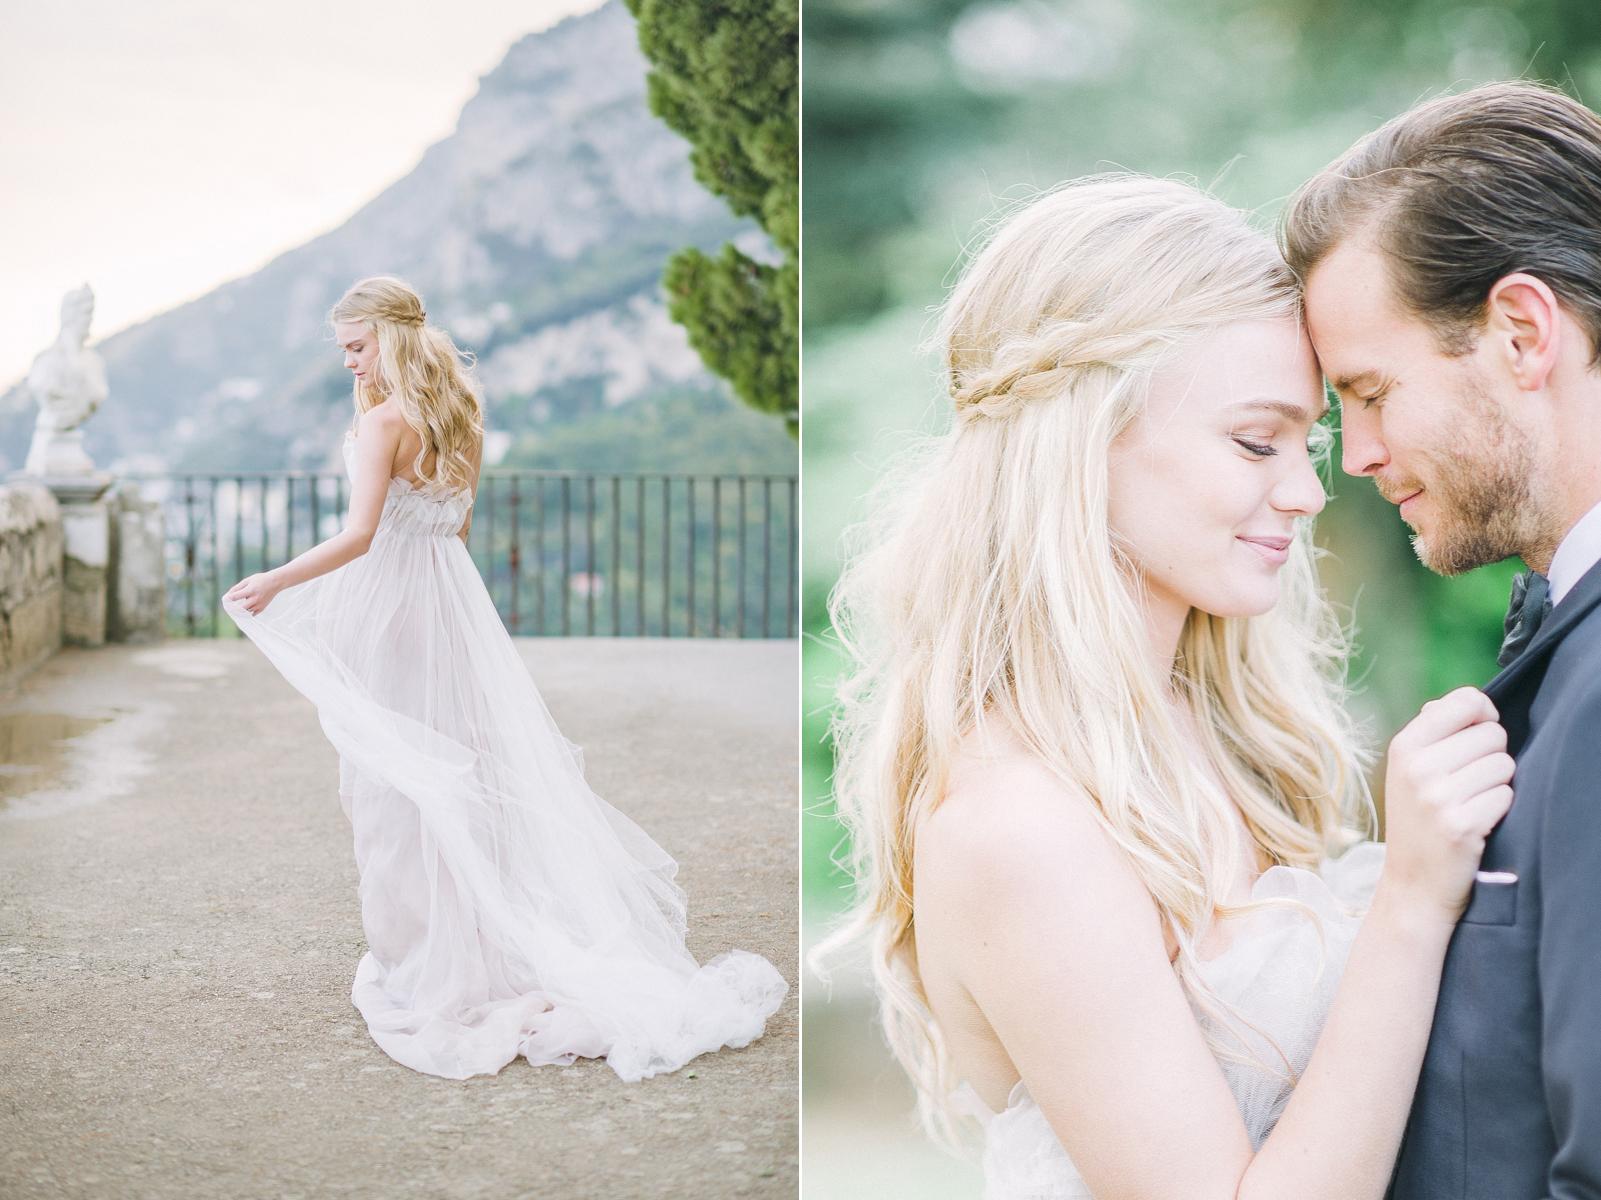 Boheme-Moon-wedding-photography-ravello-italy_17.jpg